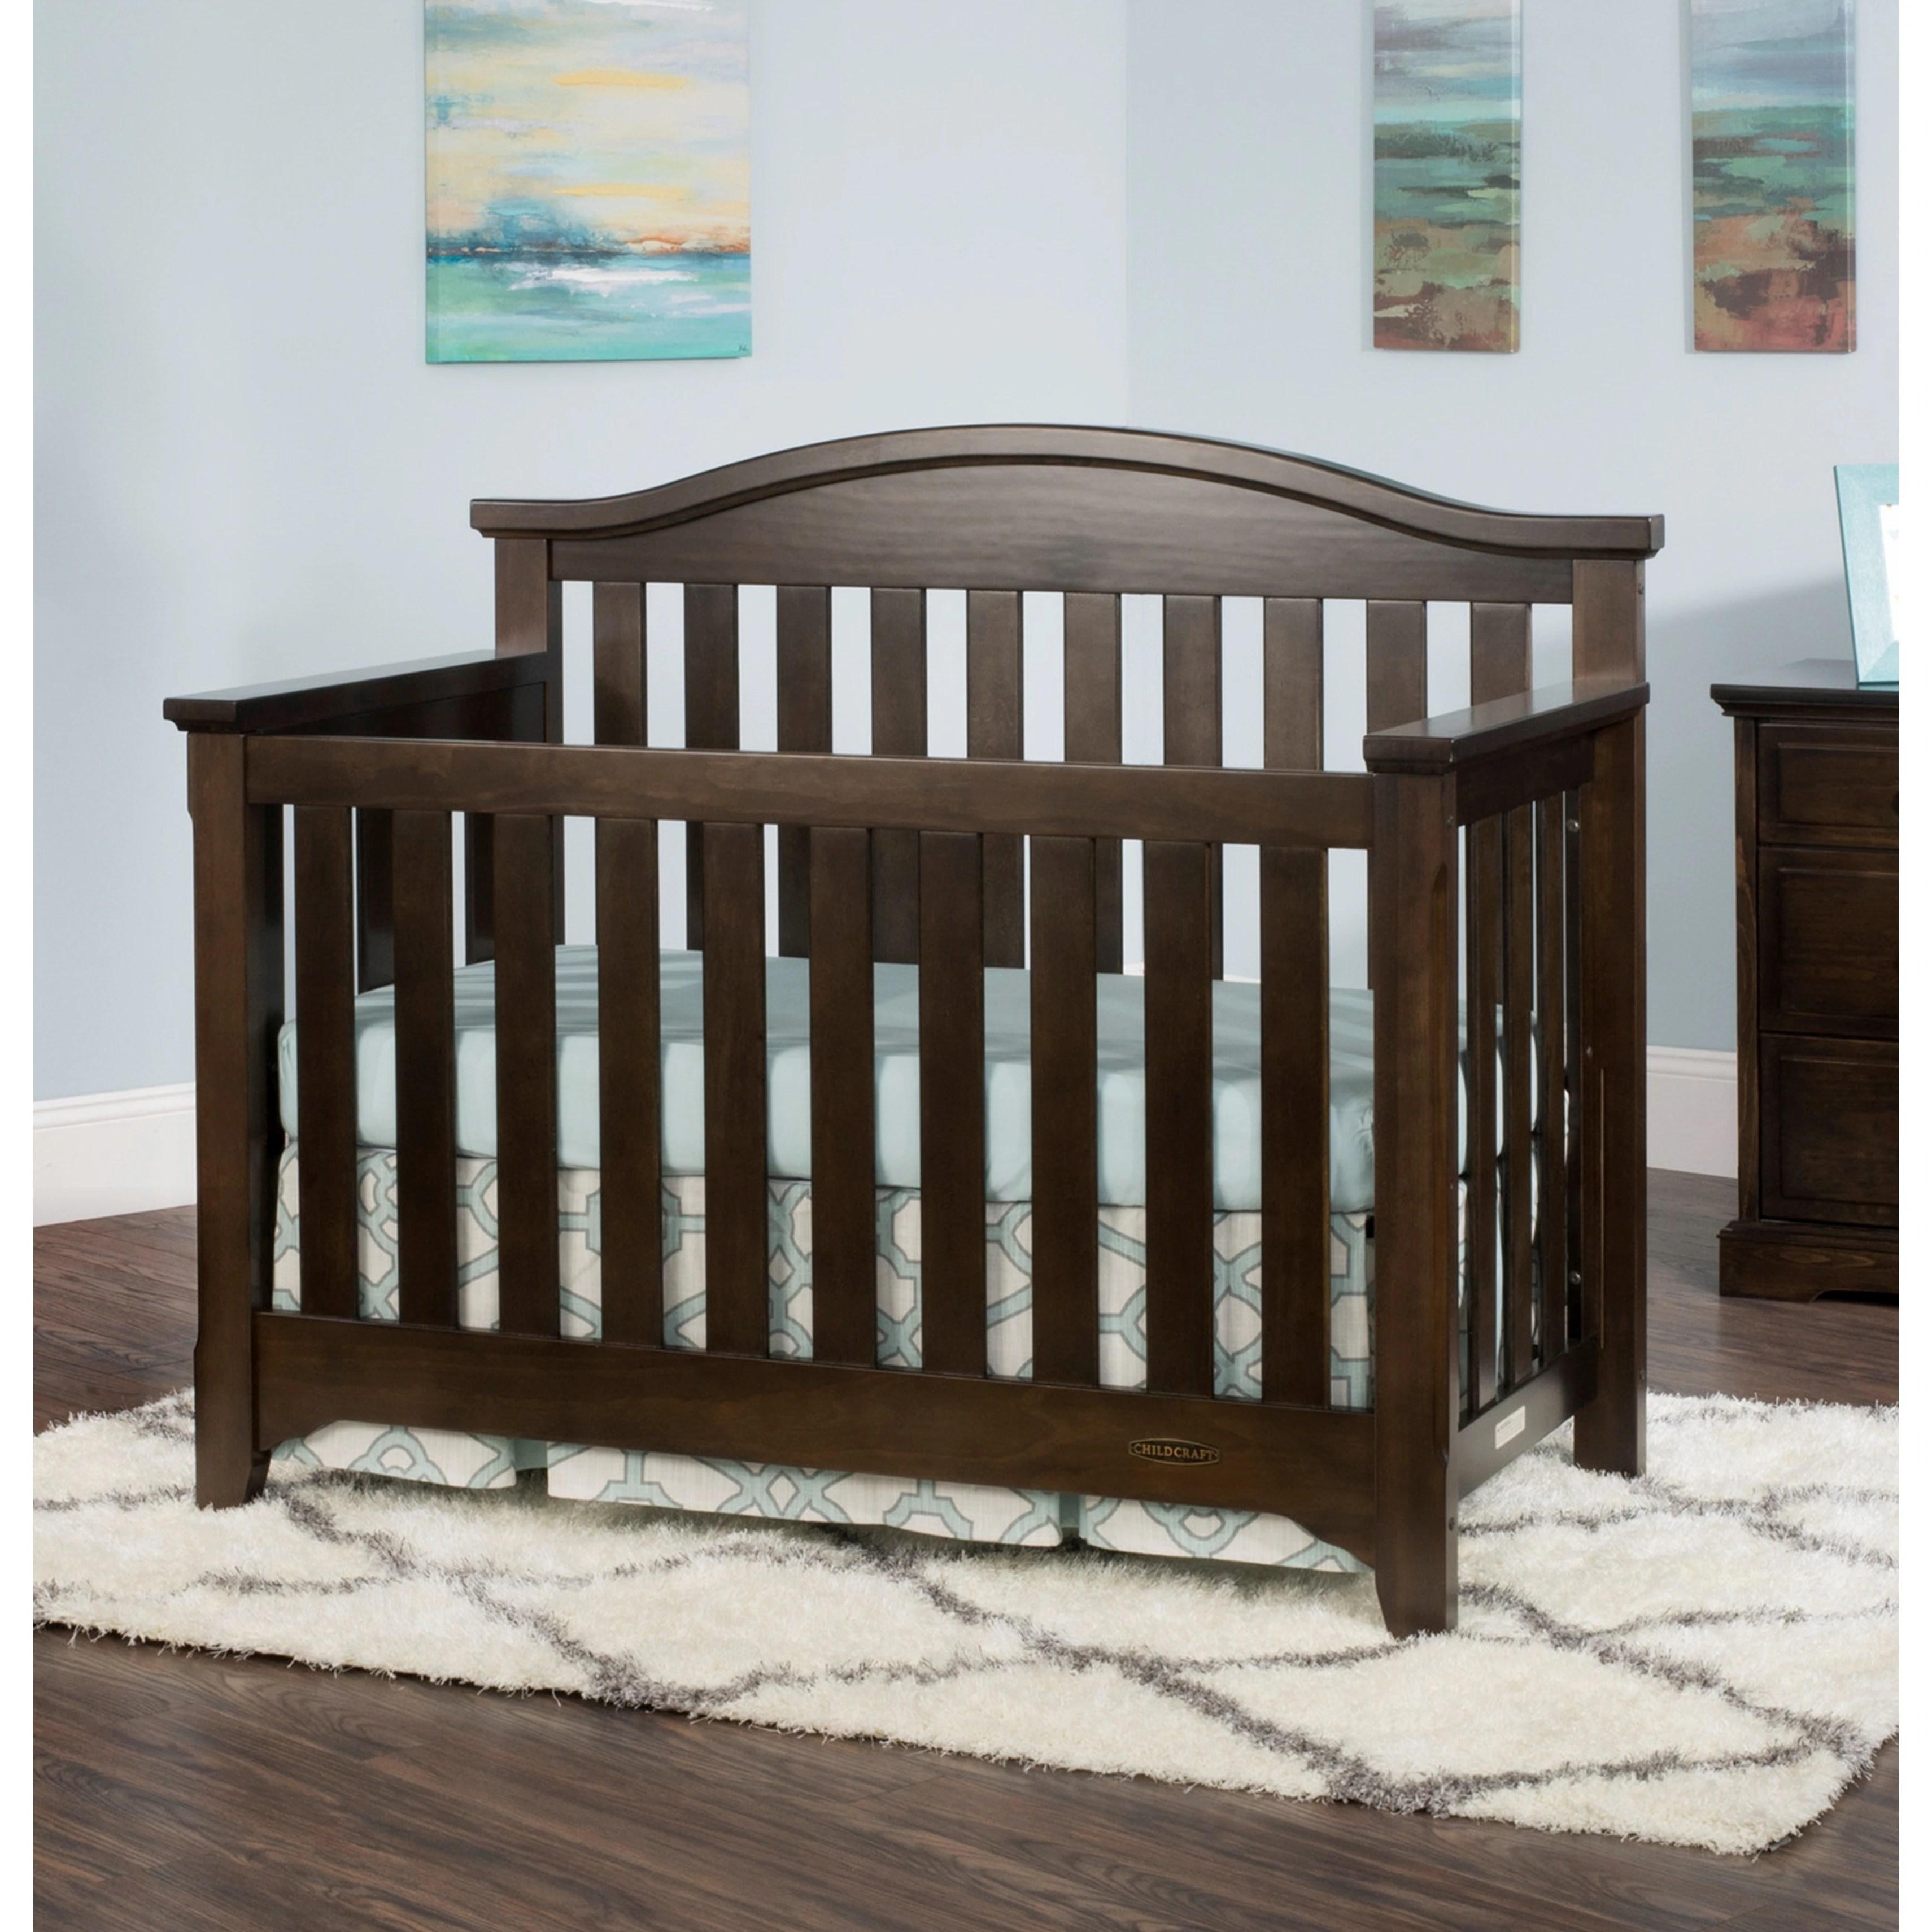 Child Craft Whitman 4-in-1 Convertible Crib, Slate